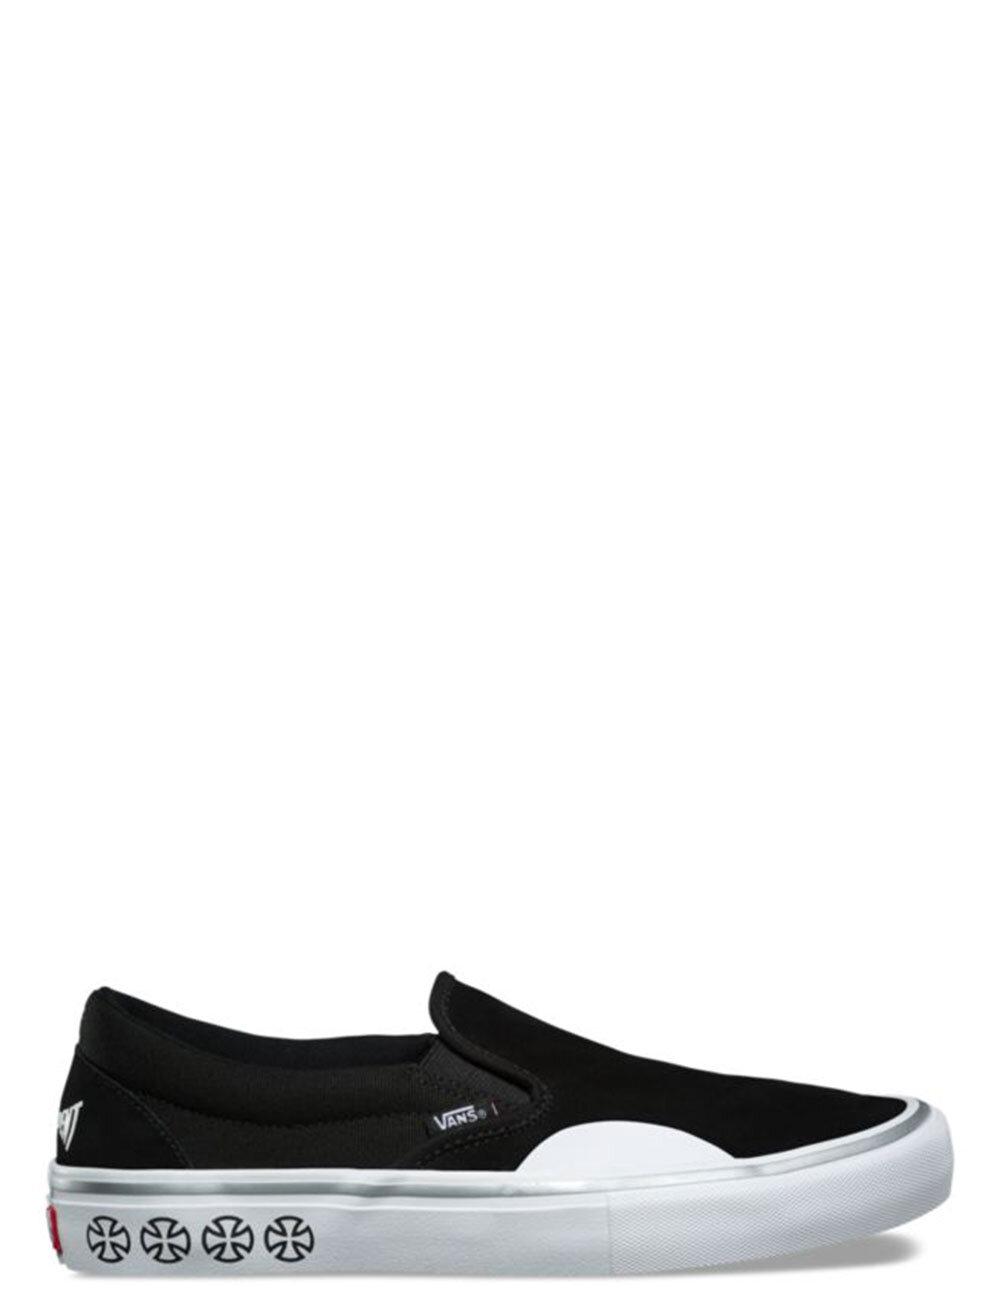 SLIP ON PRO - INDEPENDENT - Men s Footwear  9759f3689e34a